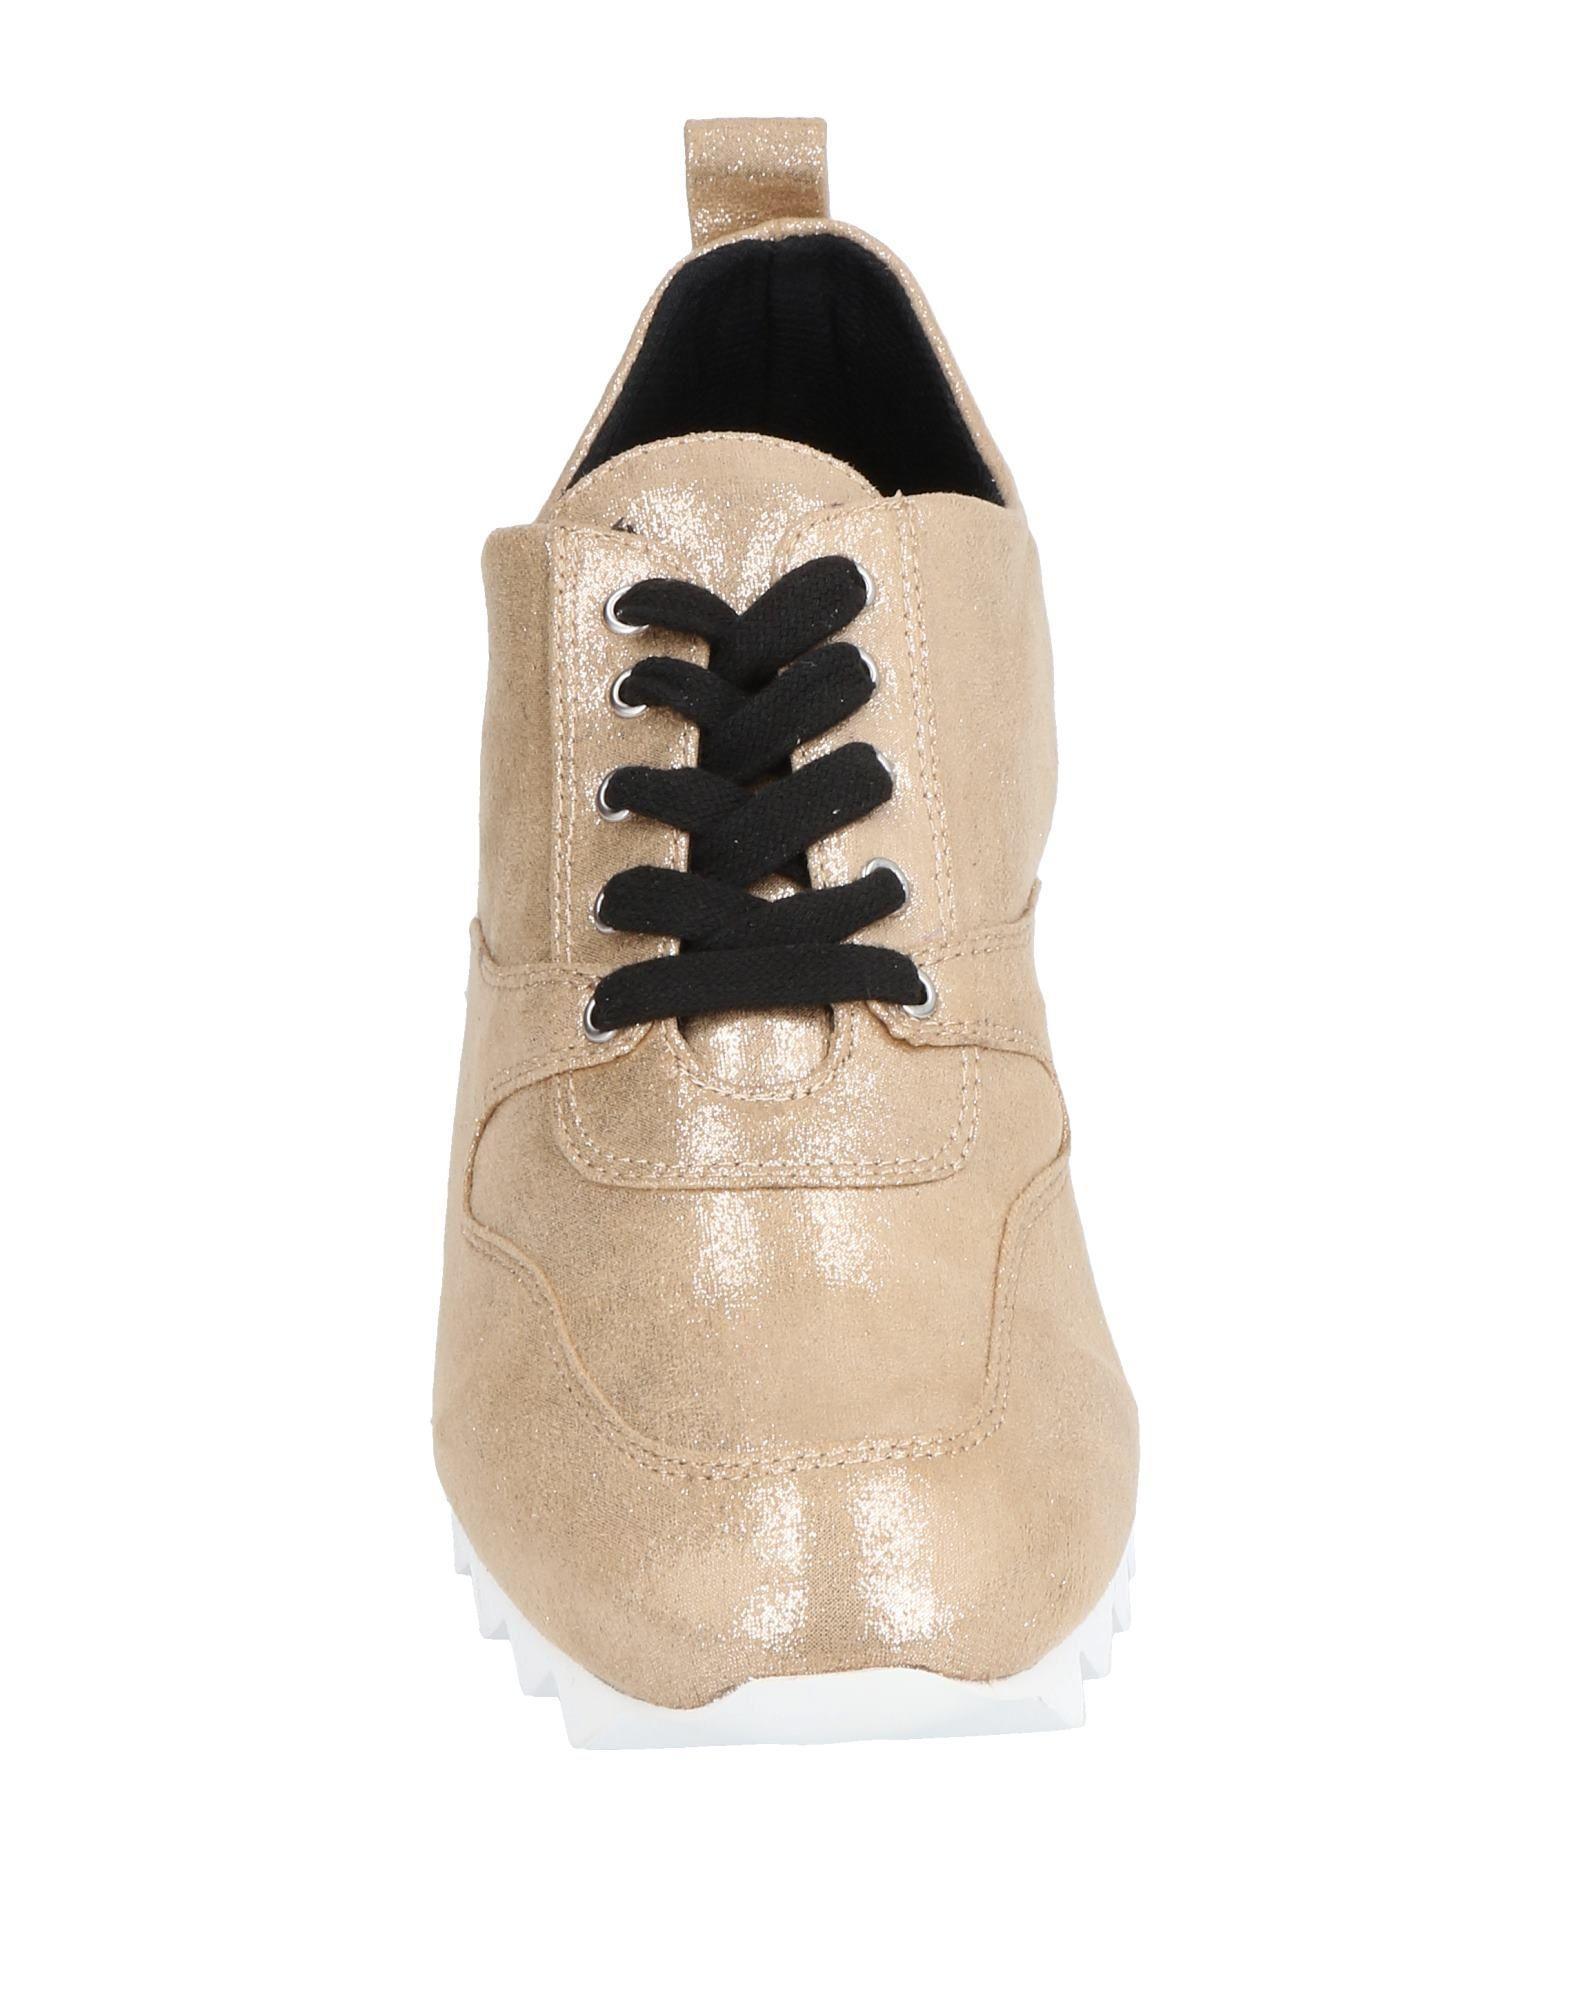 Silvian Heach Rubber Low-tops & Sneakers in Beige (Natural)